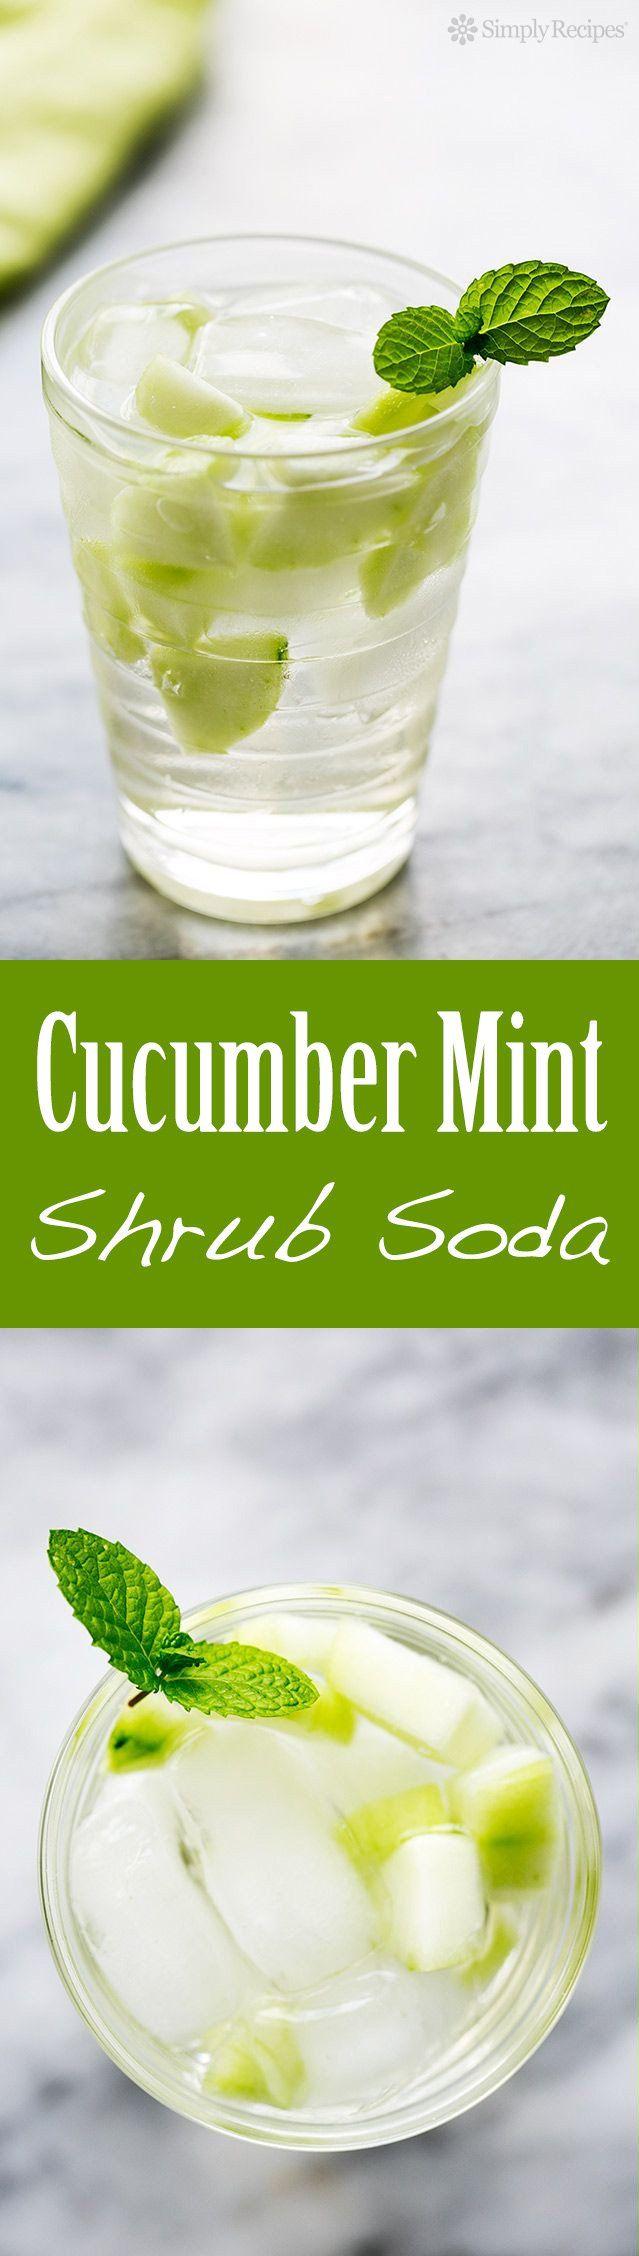 Cucumber Mint Shrub Soda ~ Cool refreshing homemade cucumber mint vinegar-based  soda